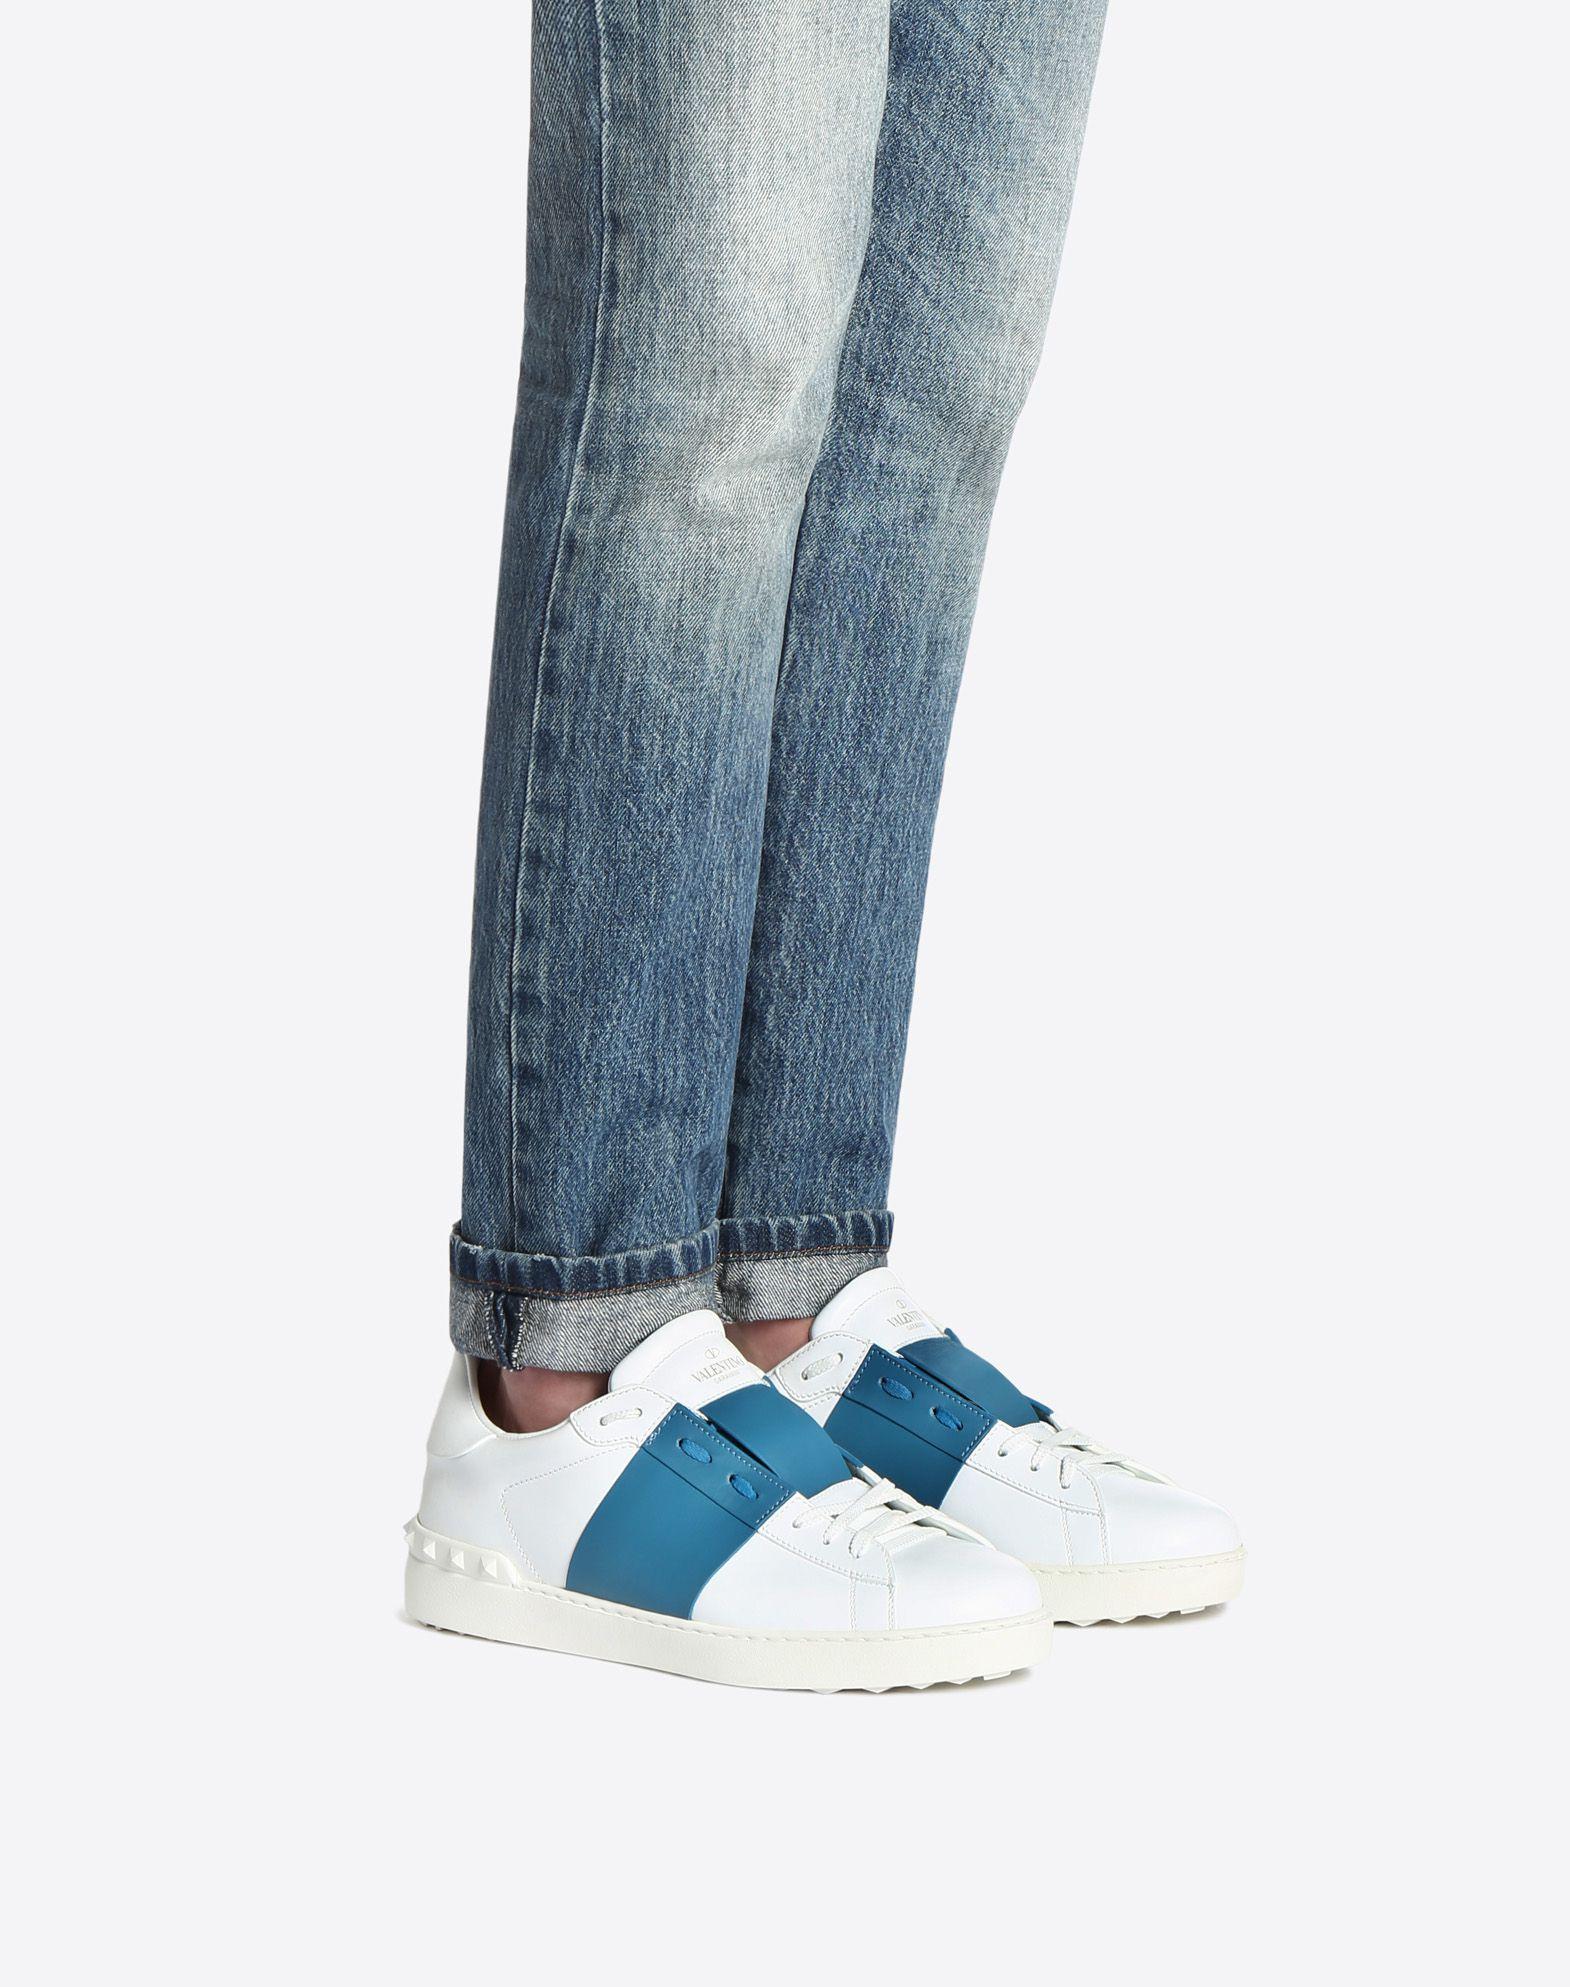 VALENTINO GARAVANI UOMO Sneaker Open  LOW-TOP SNEAKERS U a